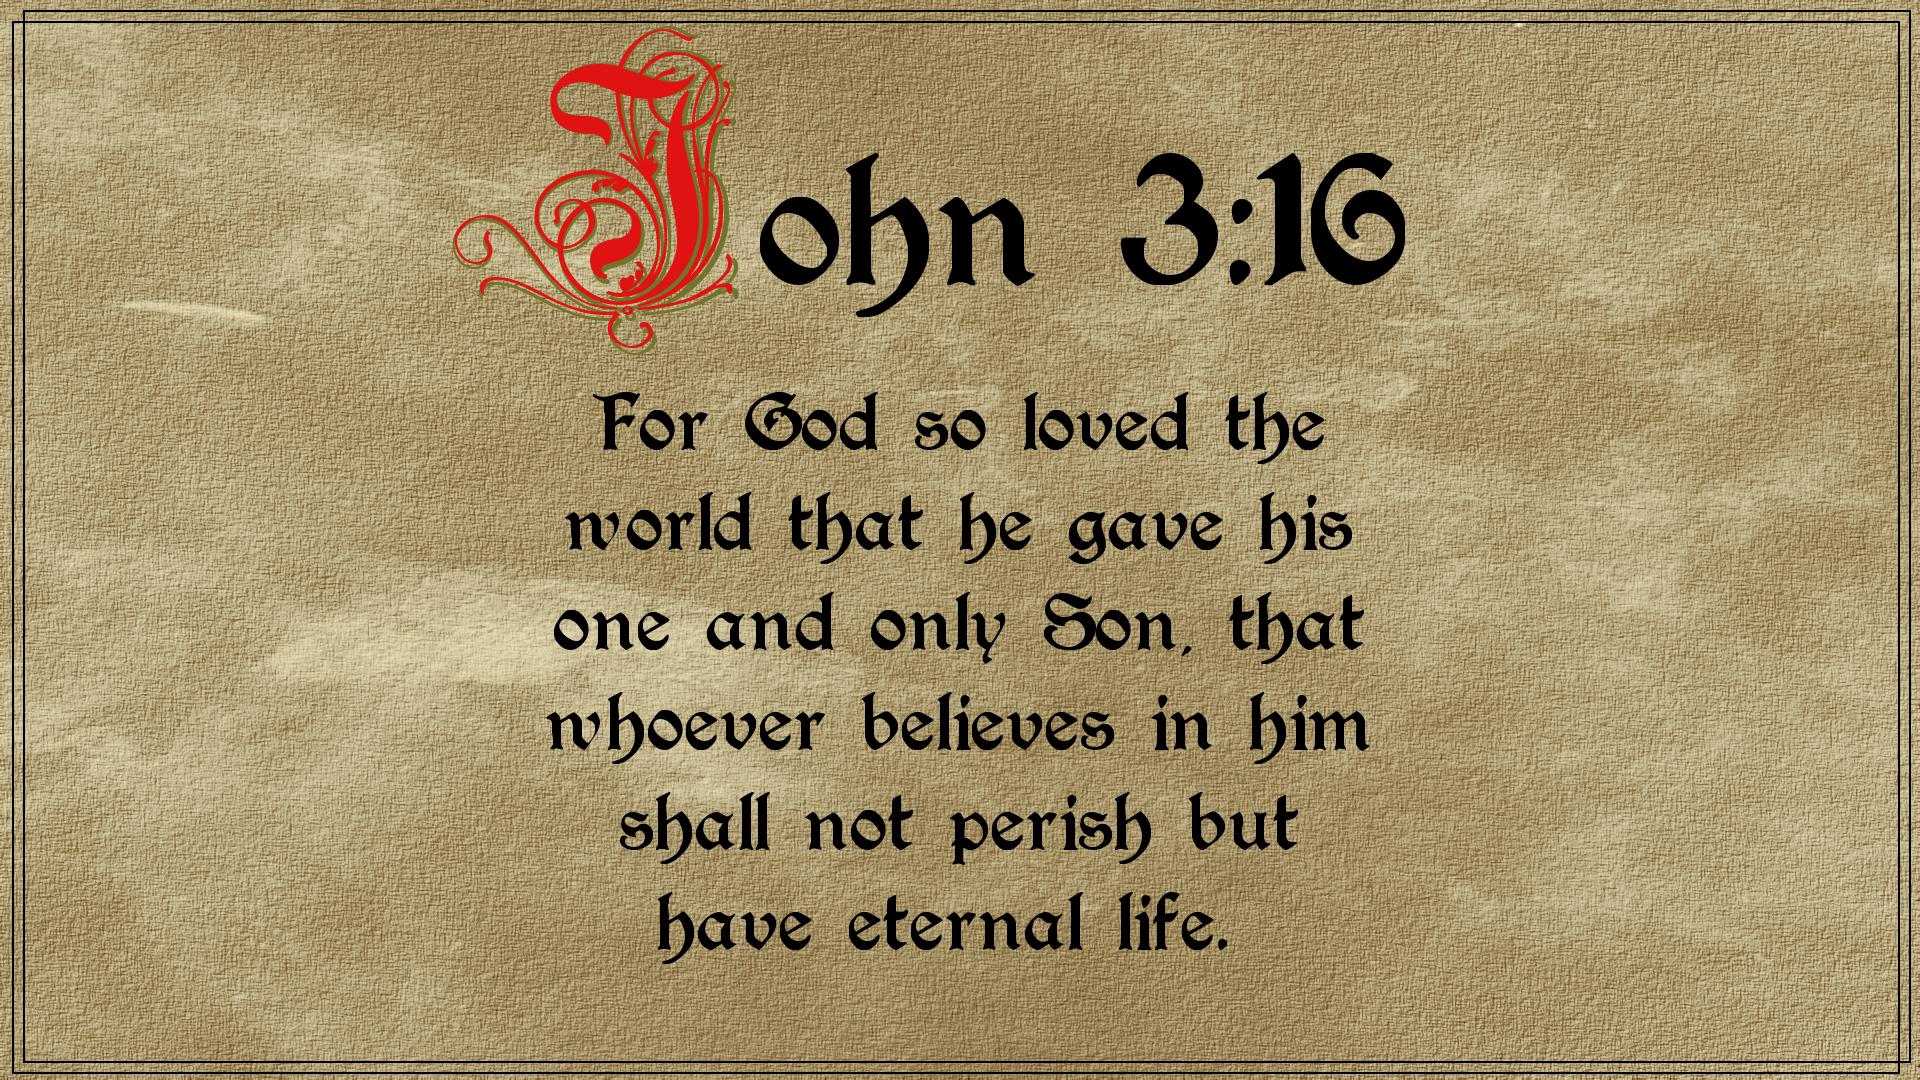 John 3:16, Bible, Catholic, Monks, HQ Photo